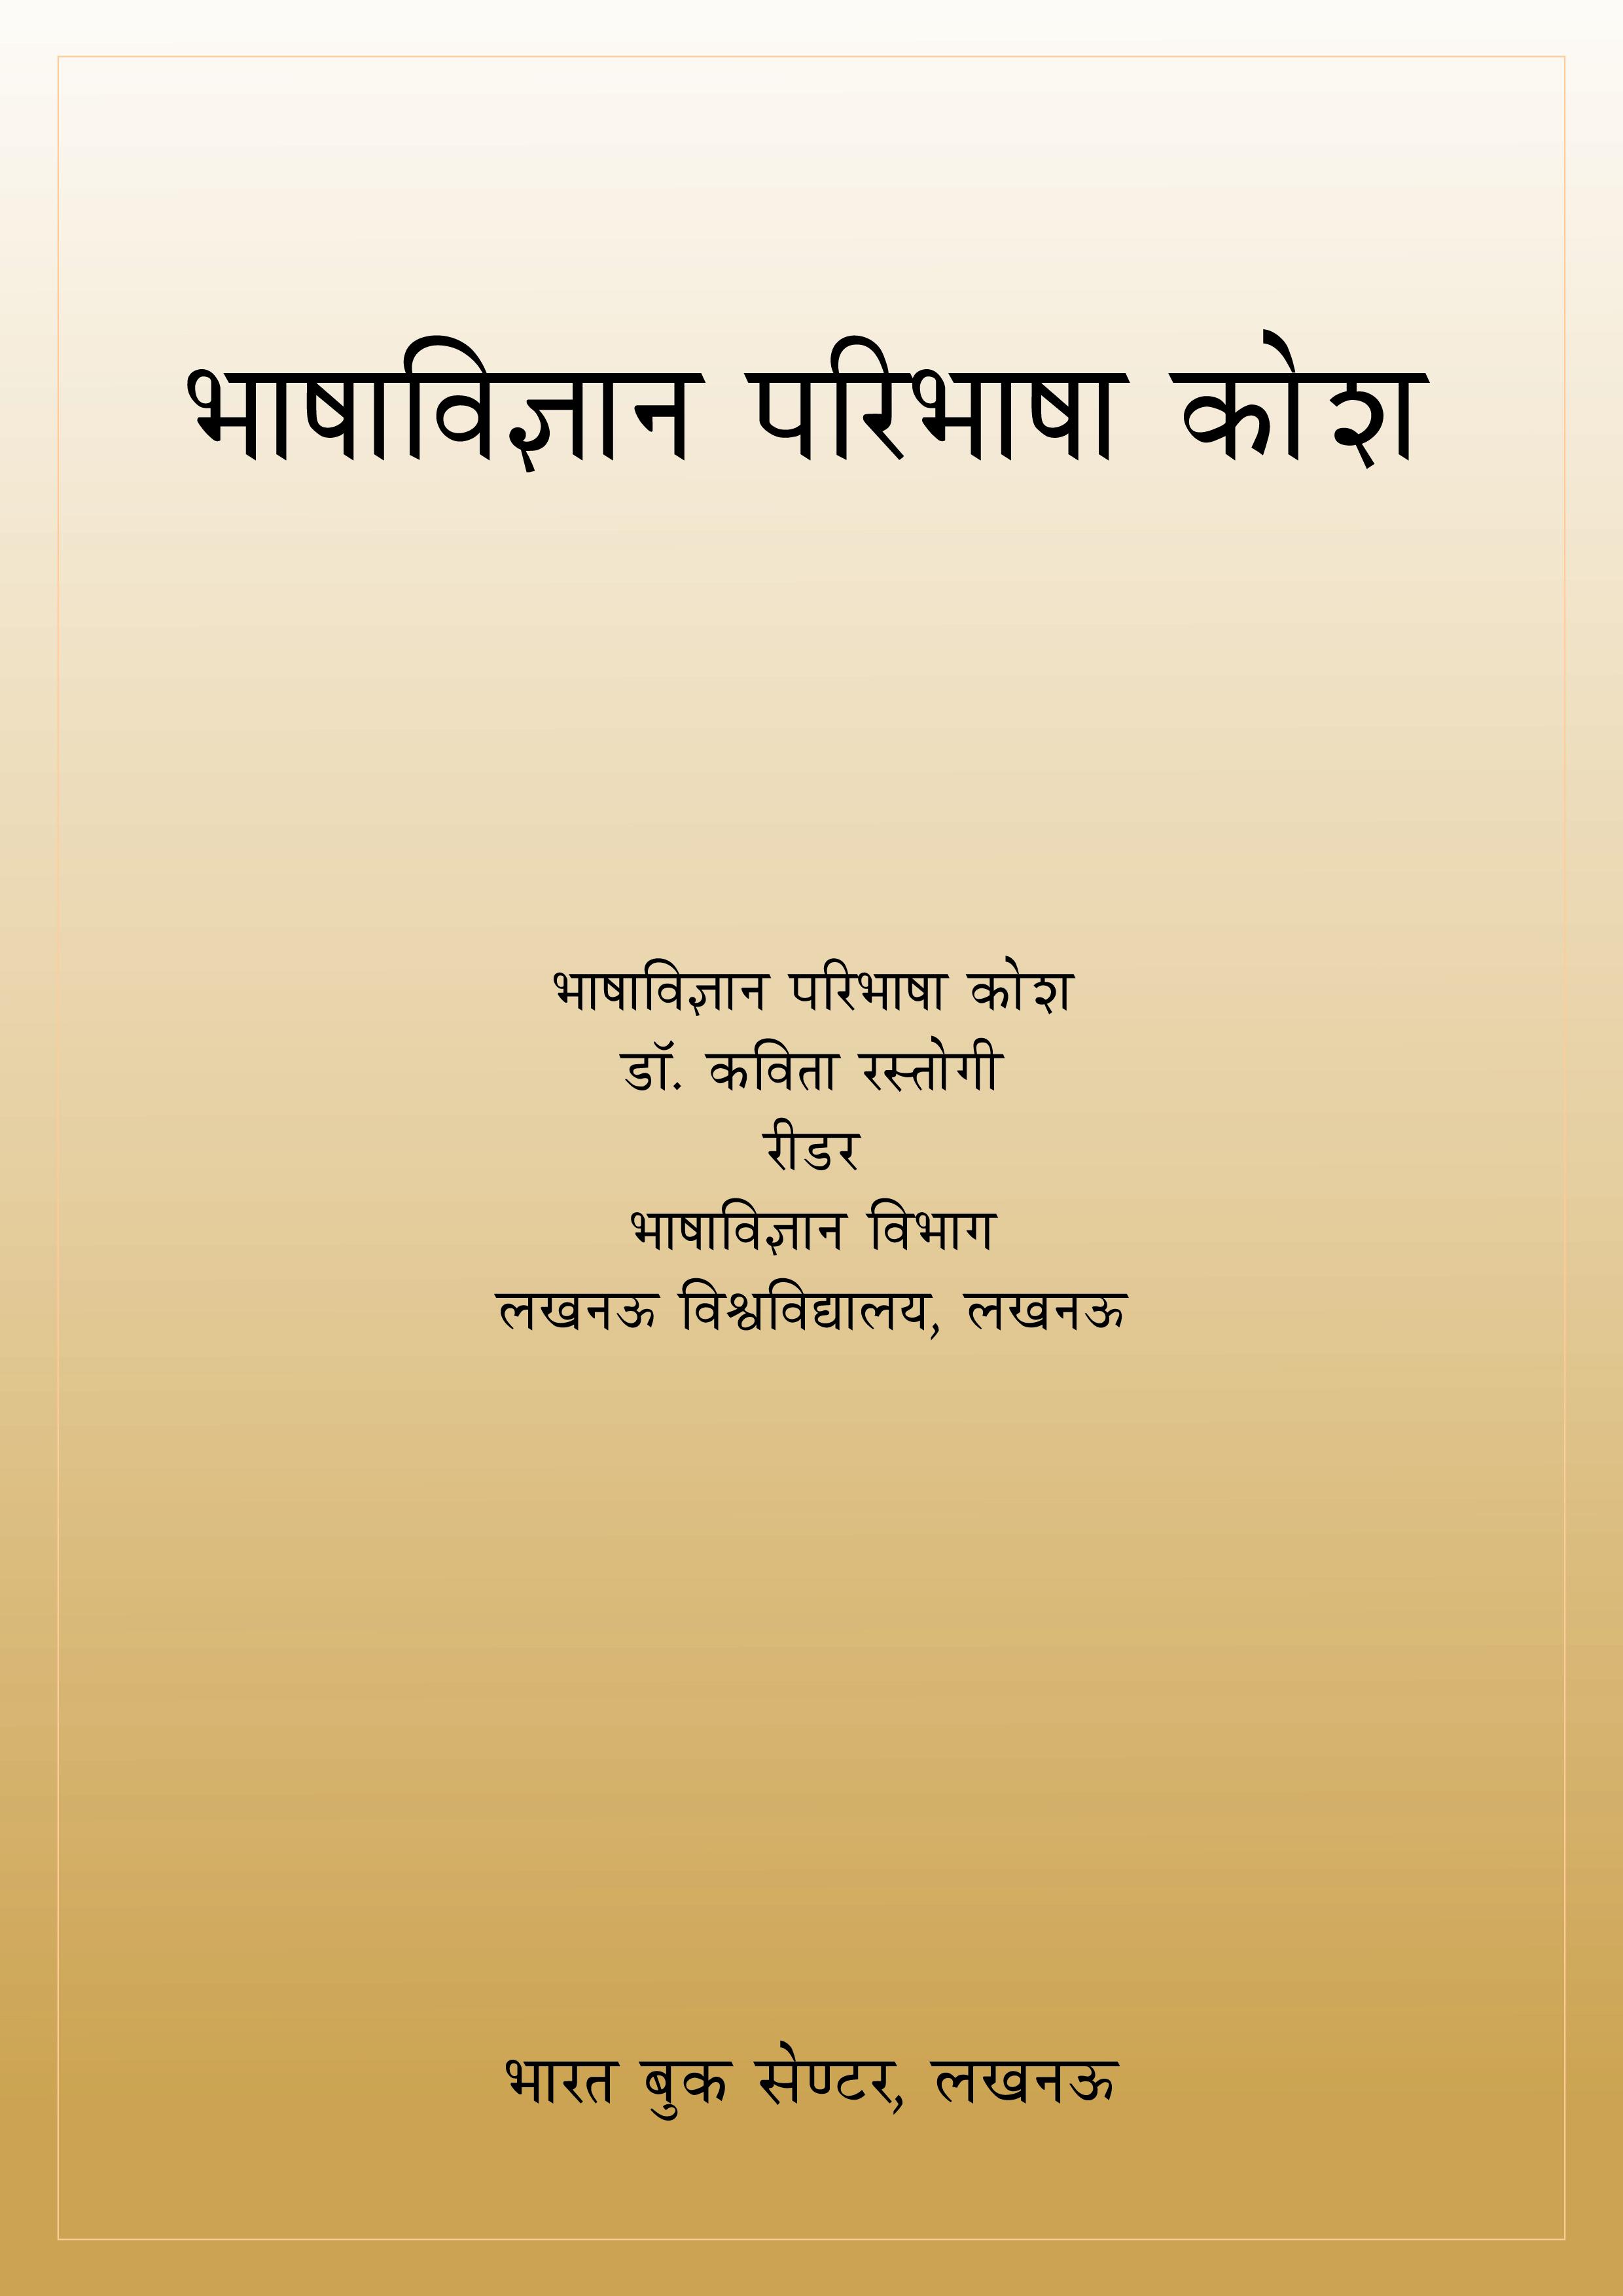 भाषाविज्ञान परिभाषा कोश | Bhasha Vigyan Paribhasha Kosh